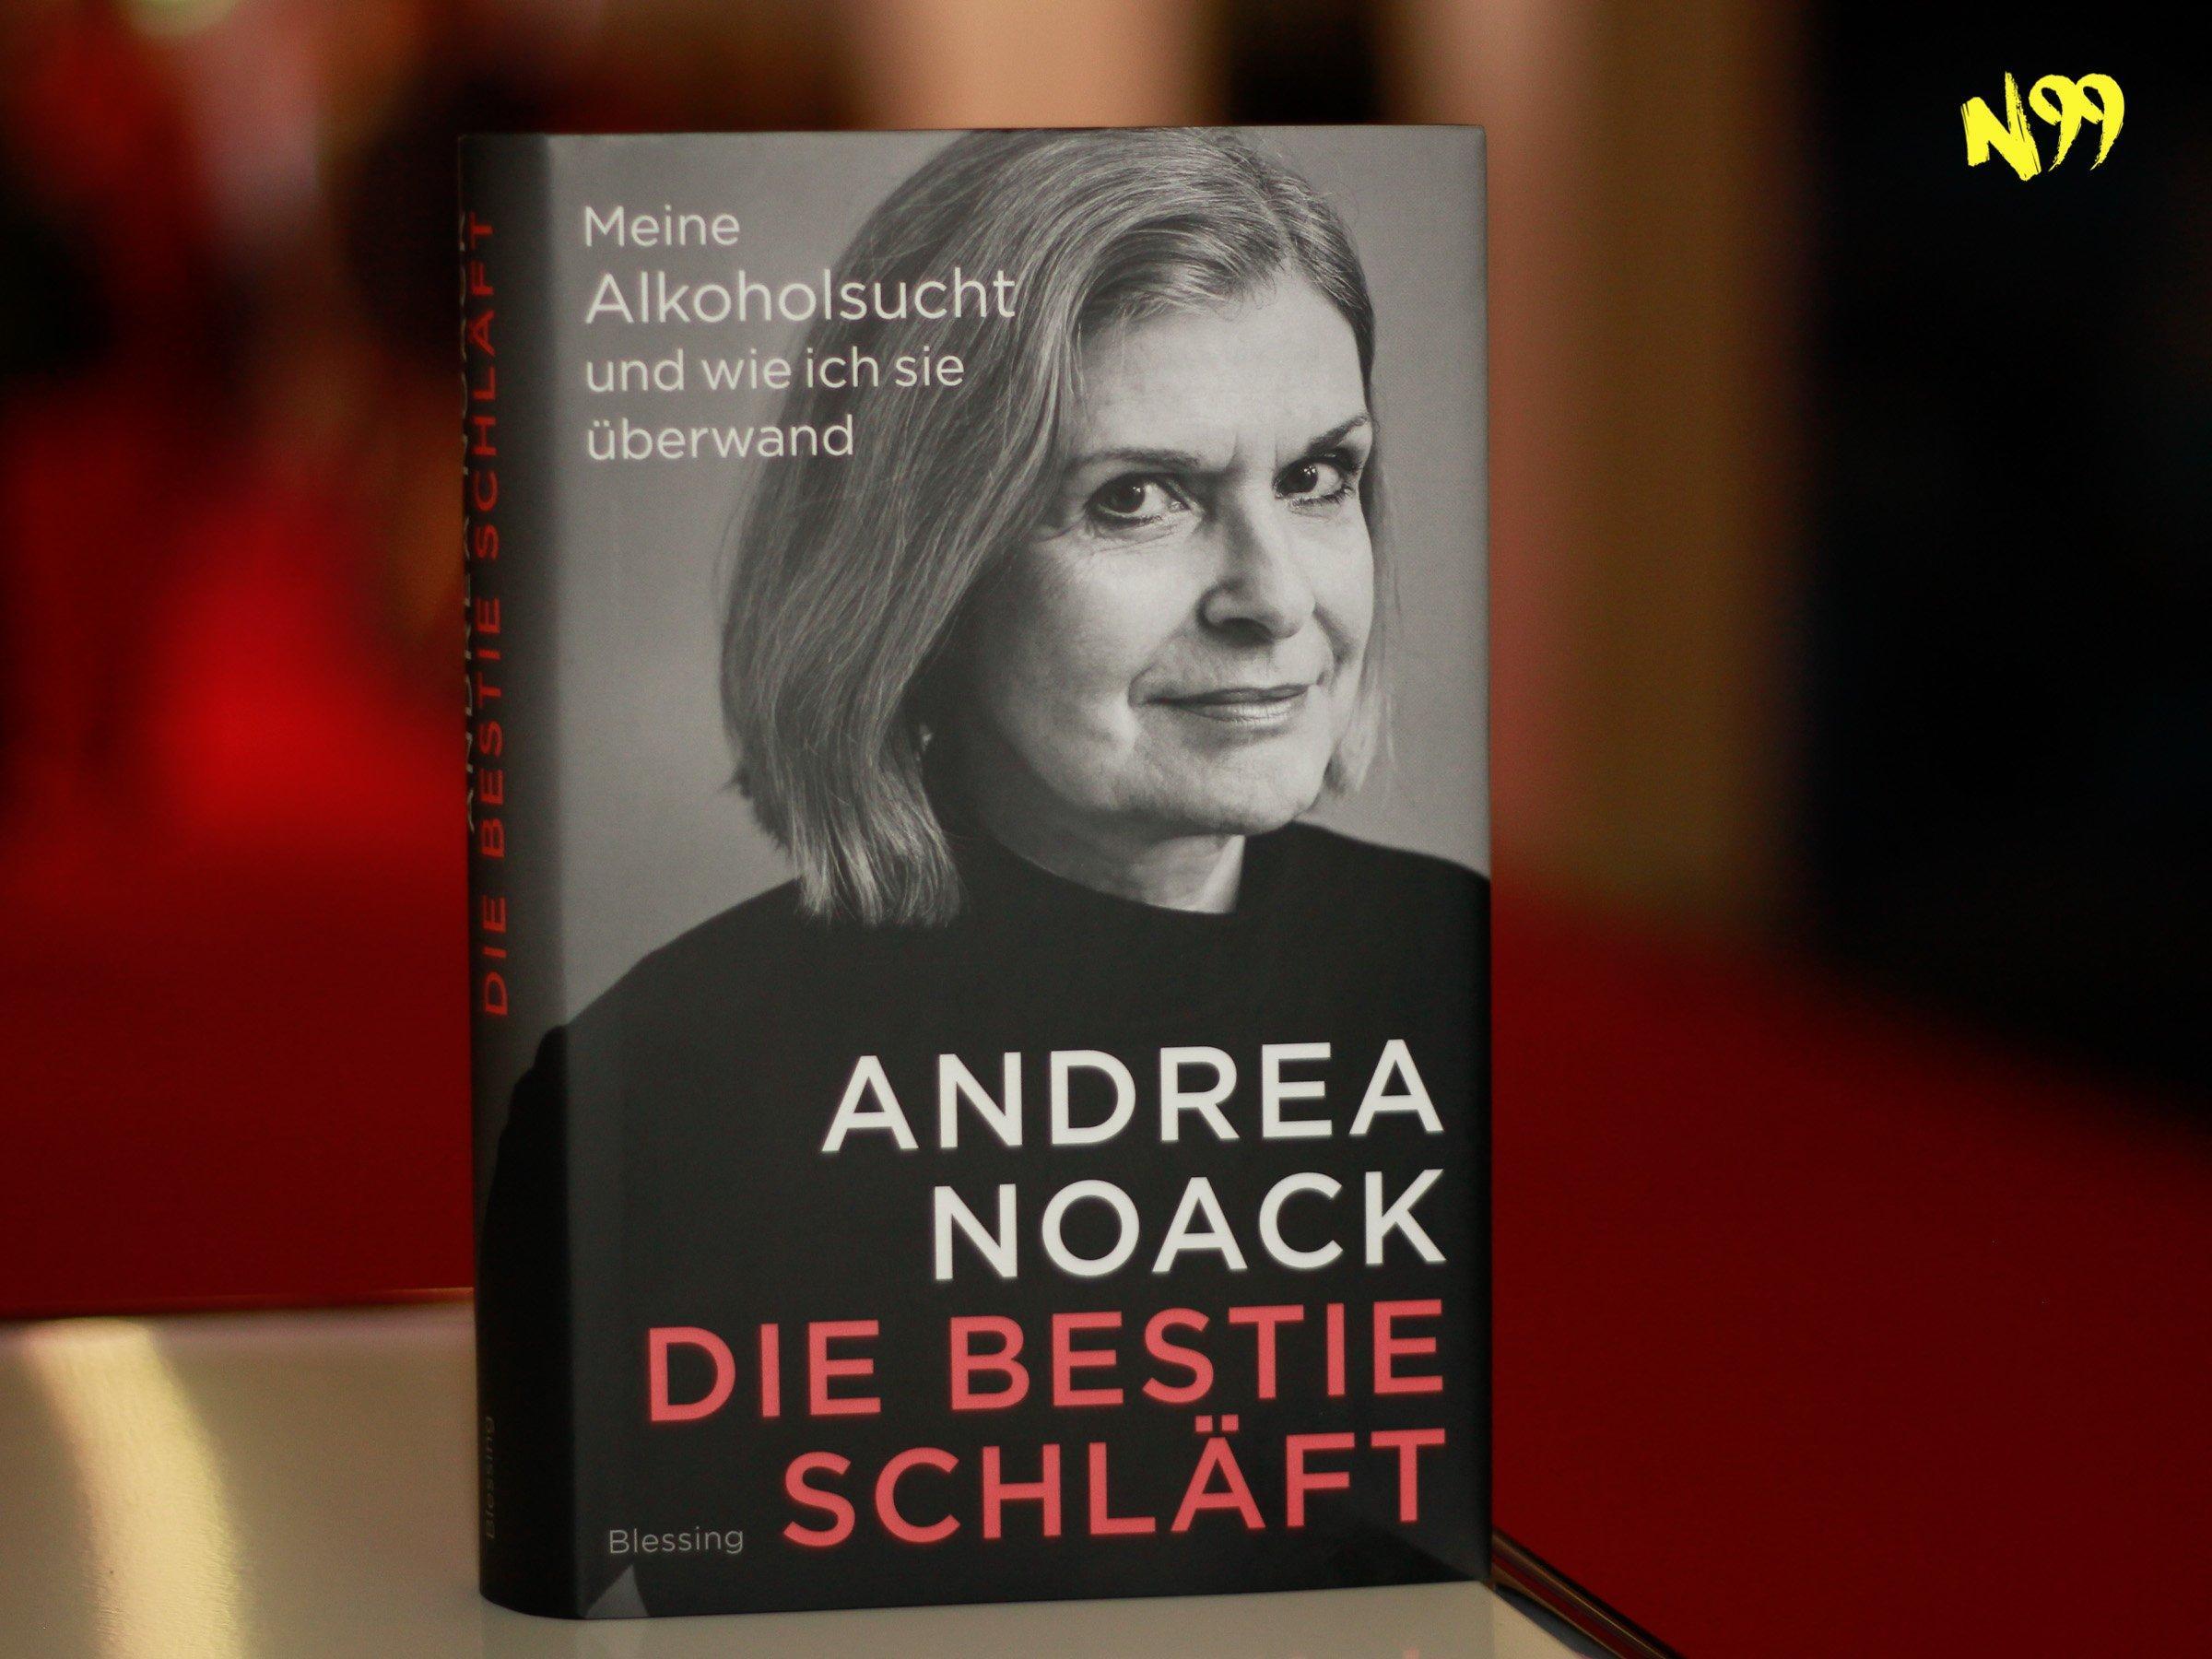 "N99 | Andrea Noack über Alkoholsucht – ""Ich habe ein völlig normales Leben"" | detektor.fm"